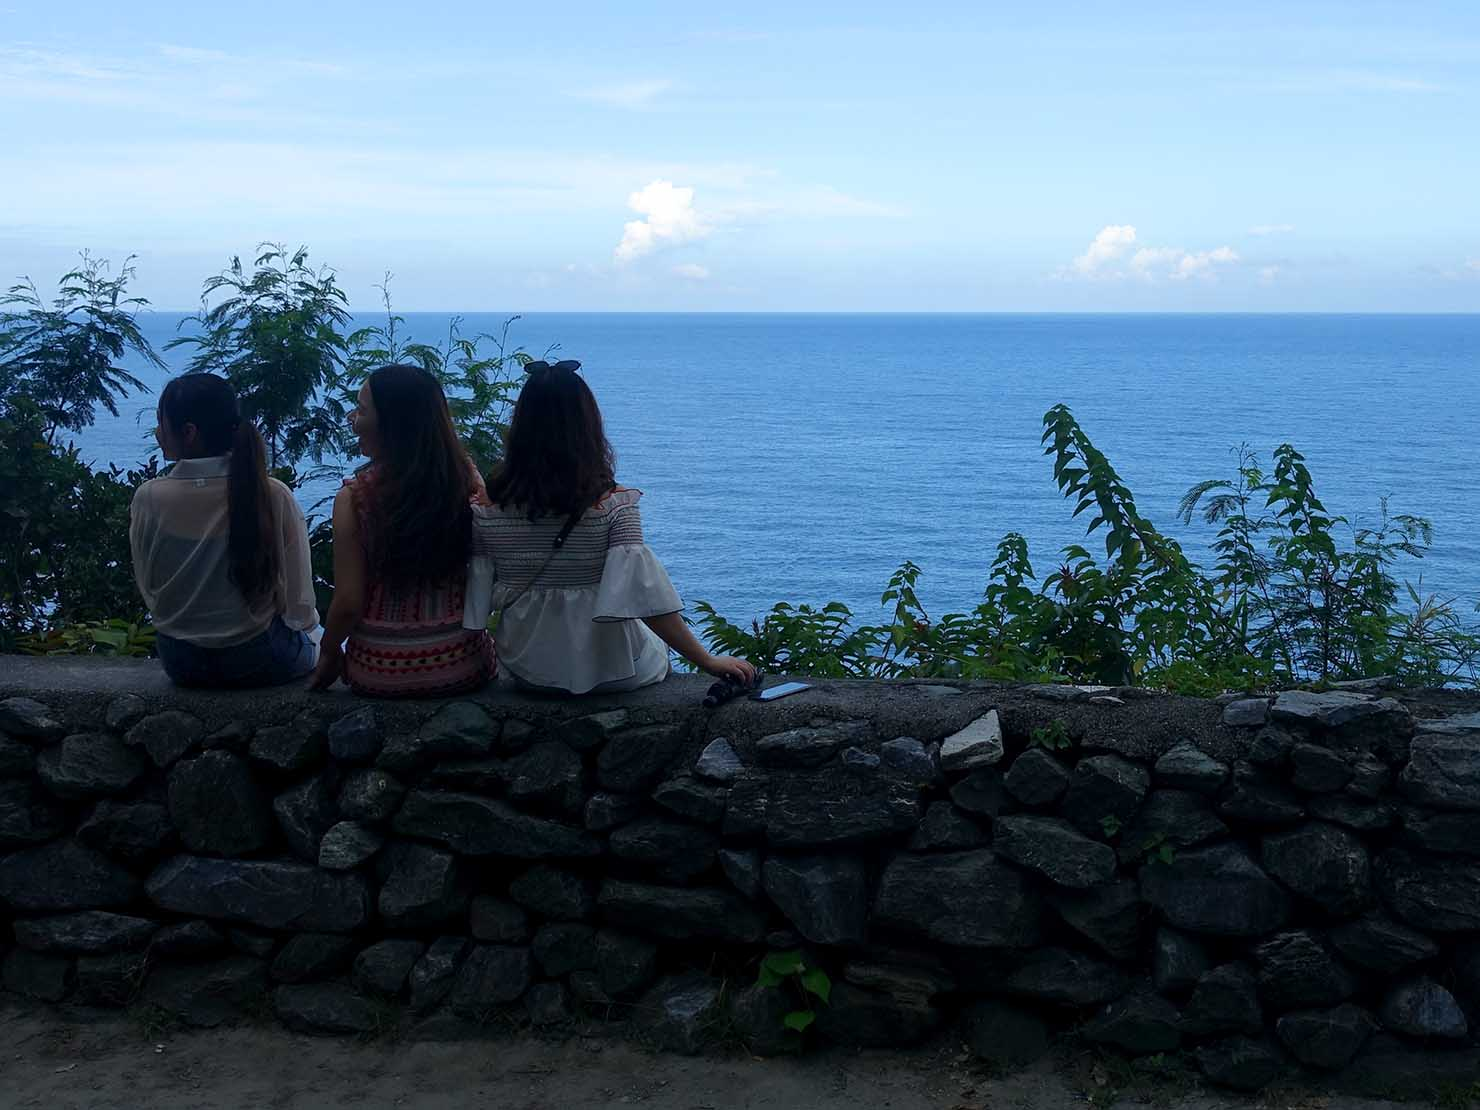 KKday外国人限定「花蓮・太魯閣(タロコ)日帰りツアー」清水斷崖で海を眺める女子グループ